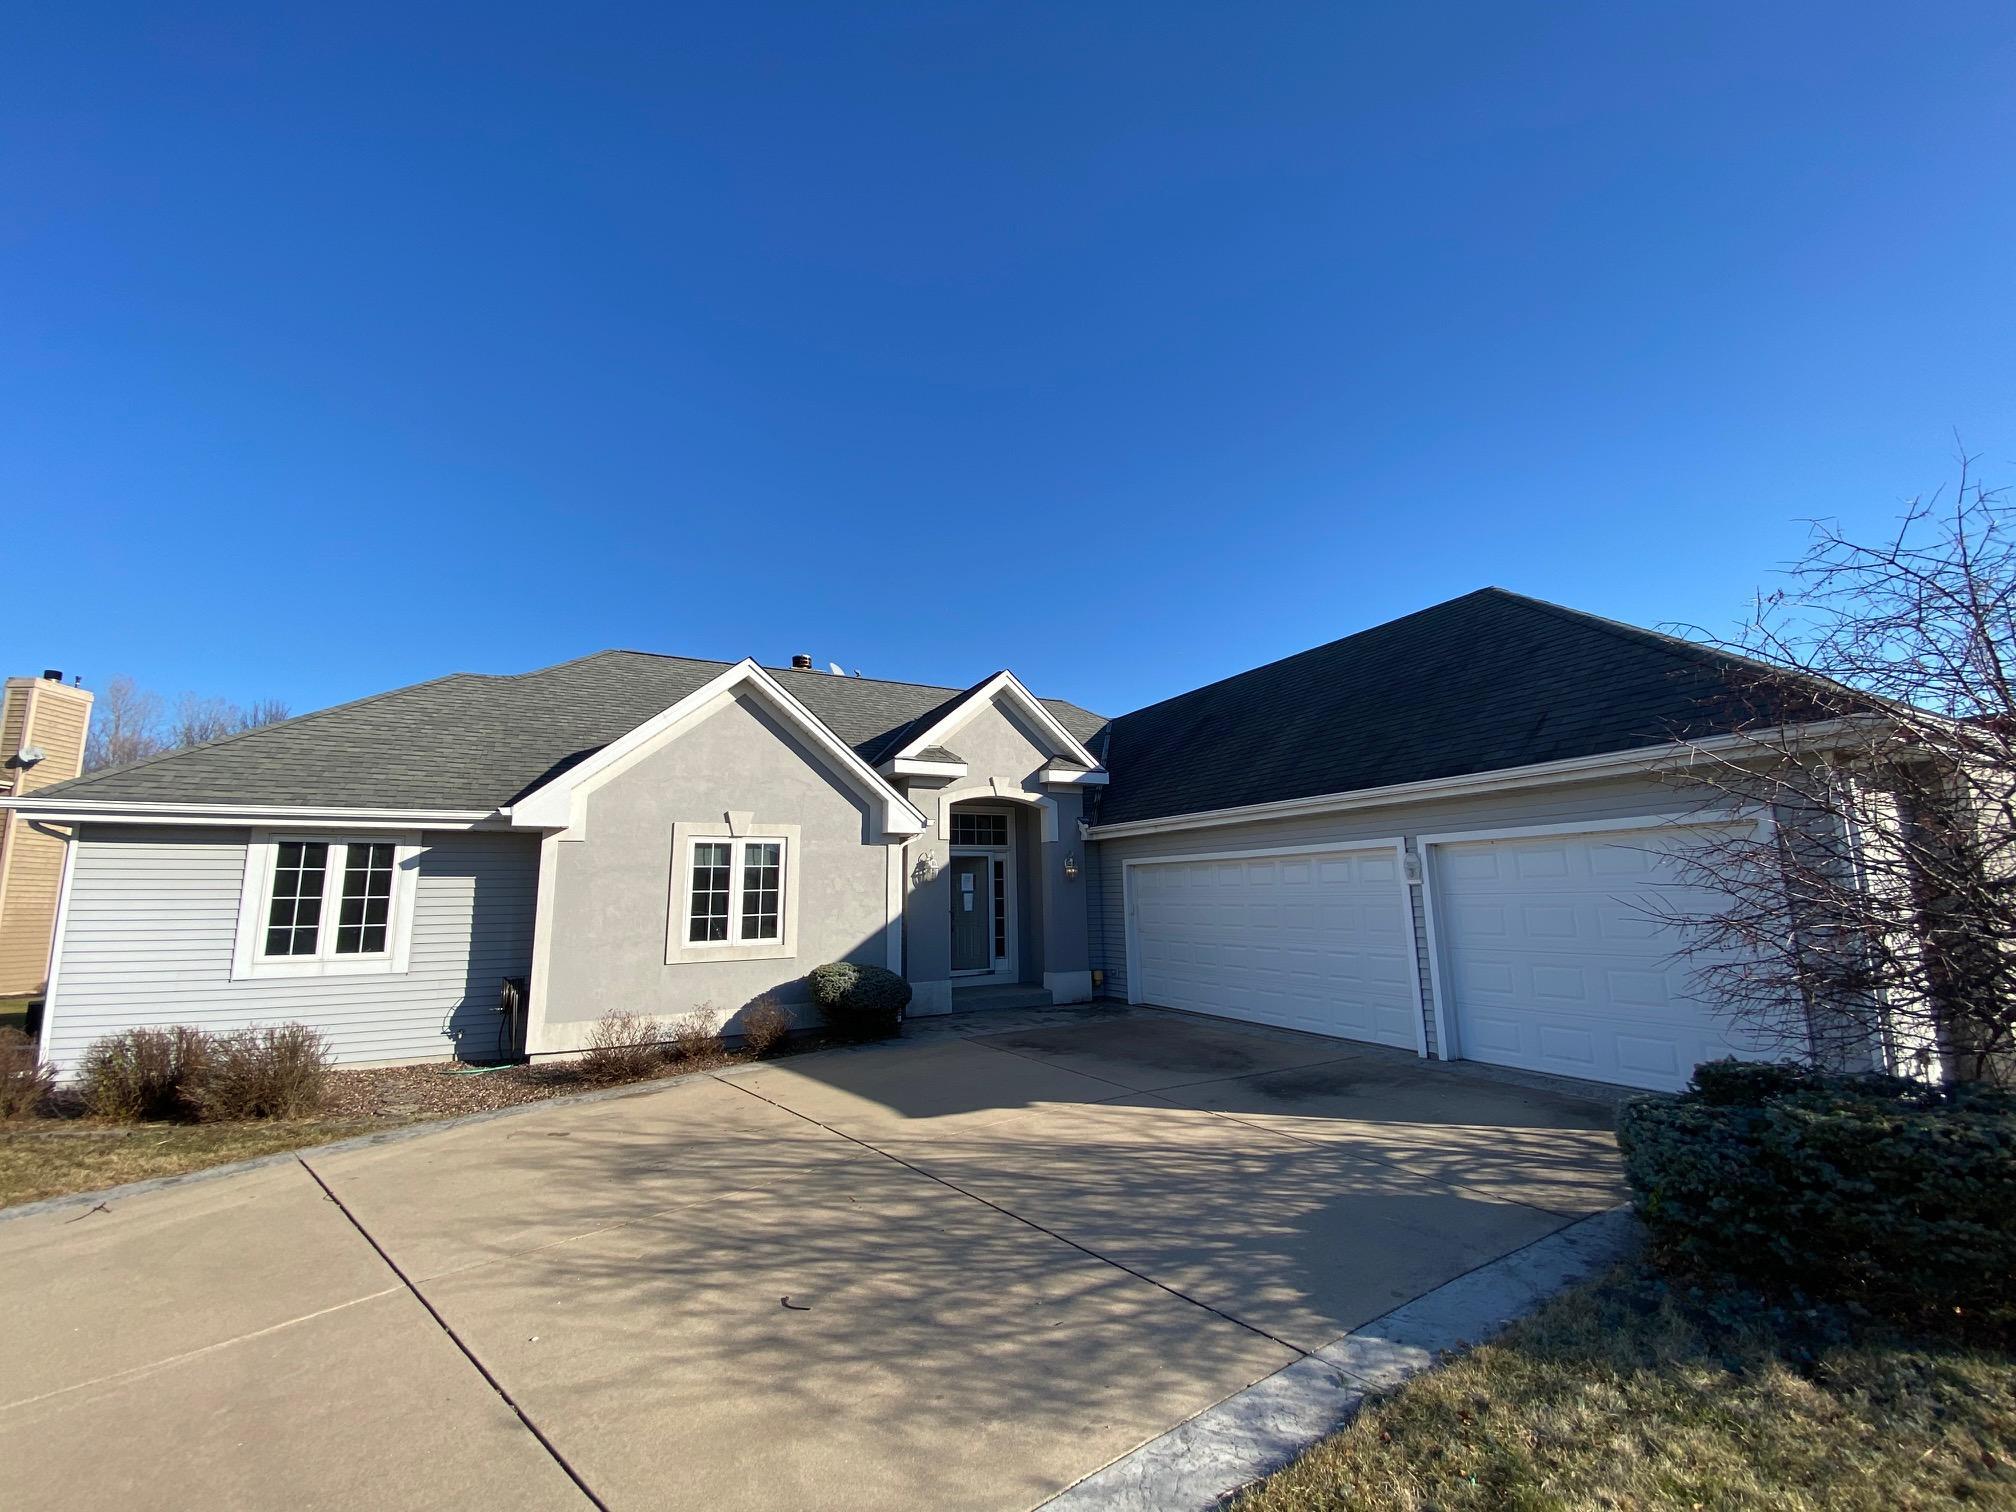 965 Grandview Ct, Oconomowoc, Wisconsin 53066, 3 Bedrooms Bedrooms, 10 Rooms Rooms,2 BathroomsBathrooms,Single-Family,For Sale,Grandview Ct,1721449